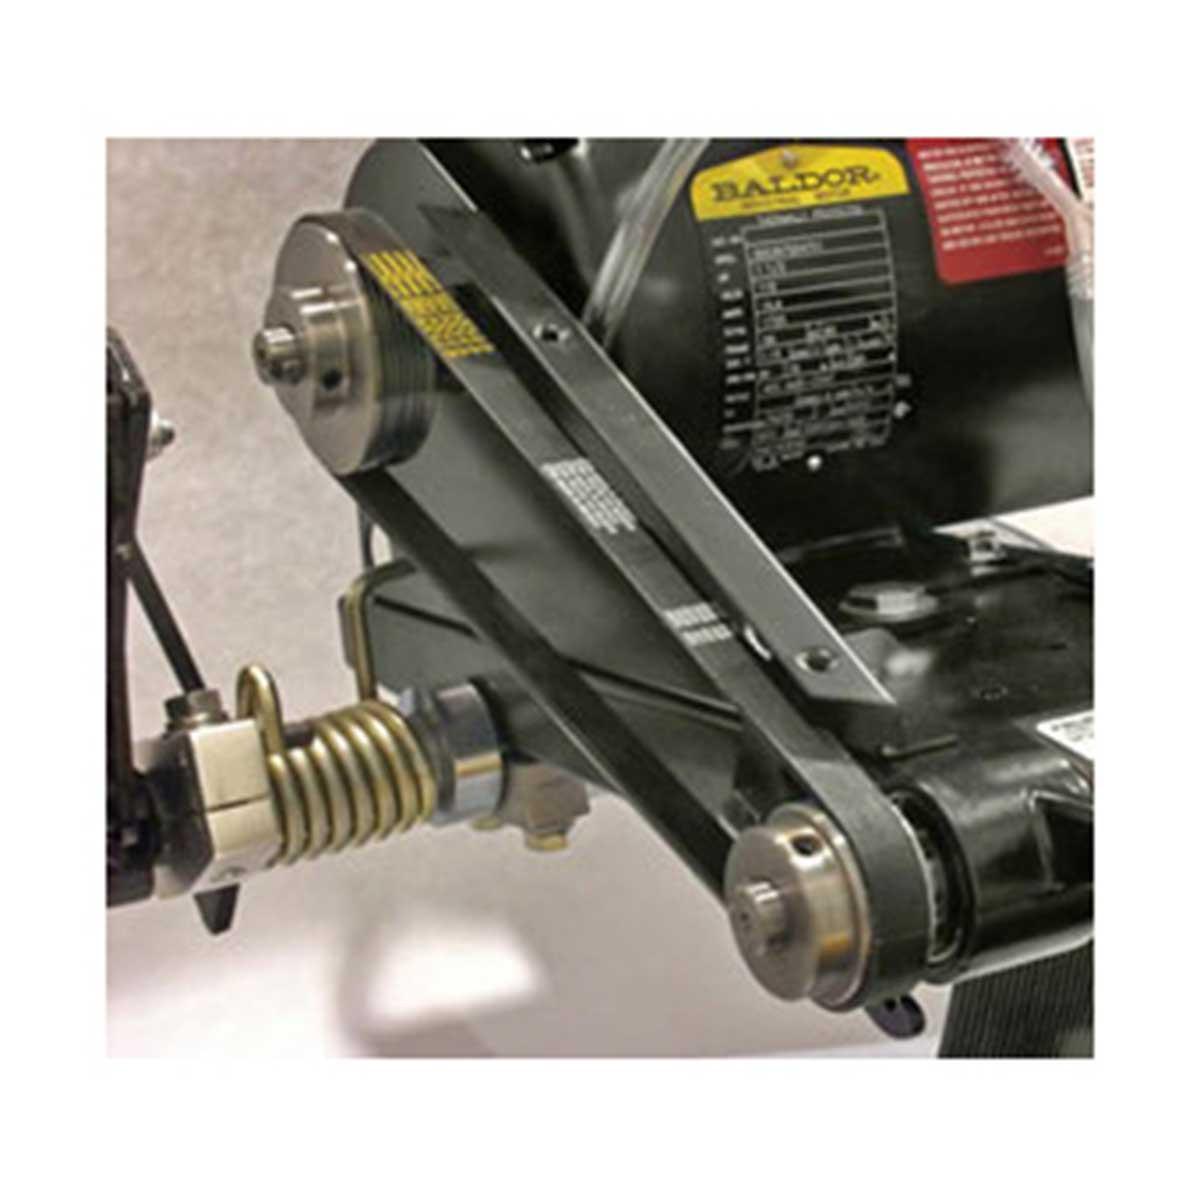 Husqvarna Tilematic Baldor high torque belt driven motor